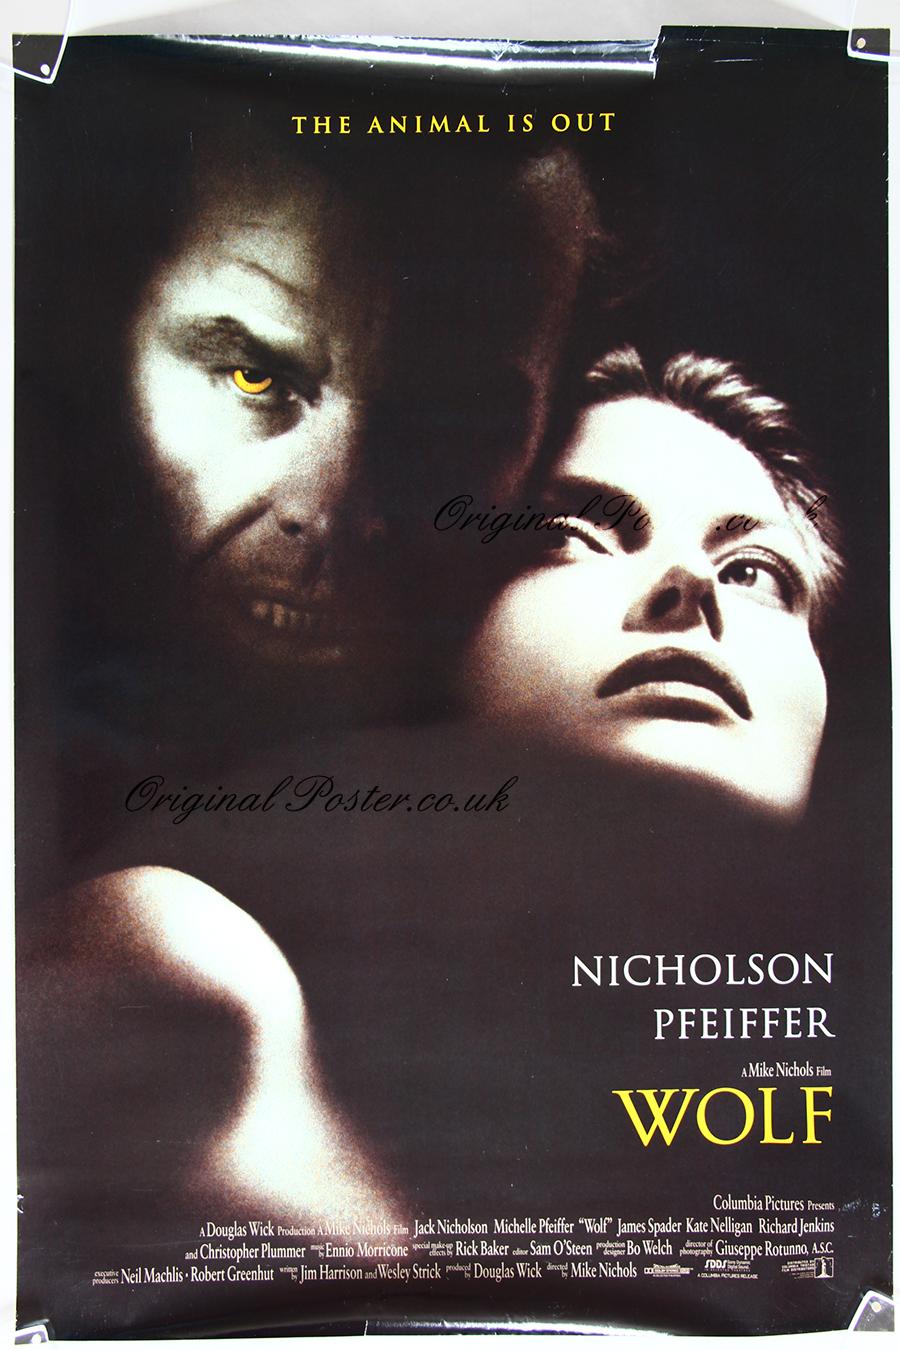 Wolf, Original Vintage Film Poster | Original Poster ...